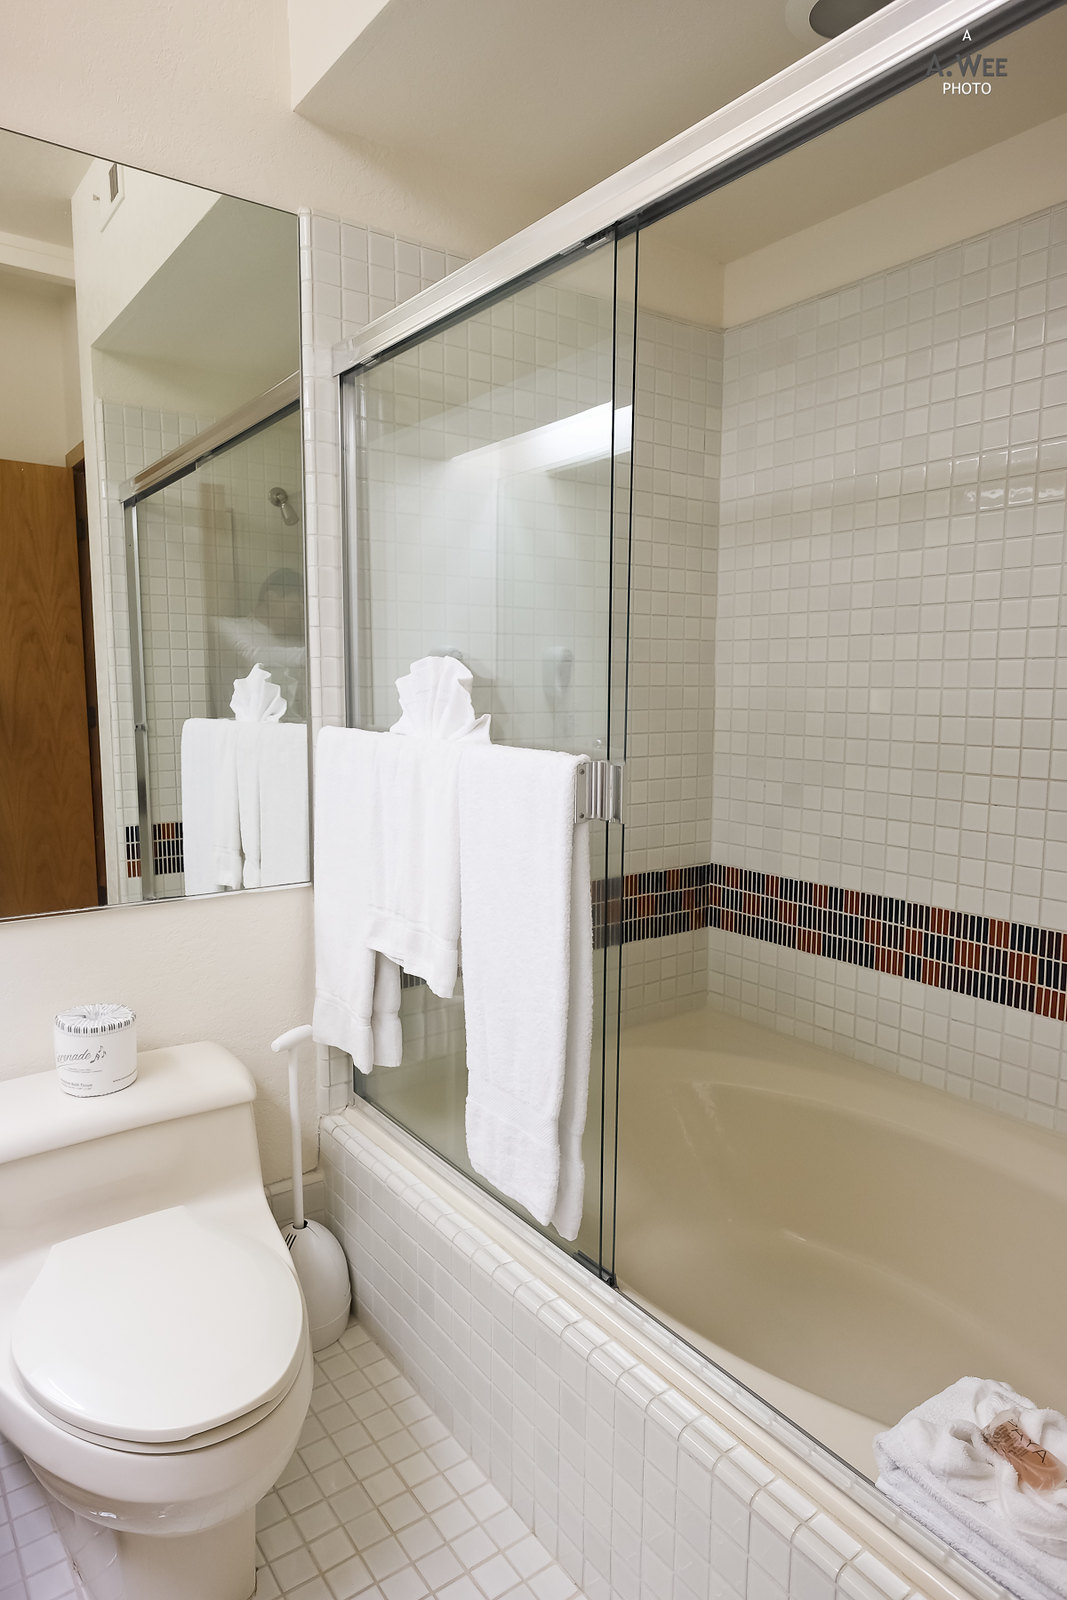 Shower in the bathtub